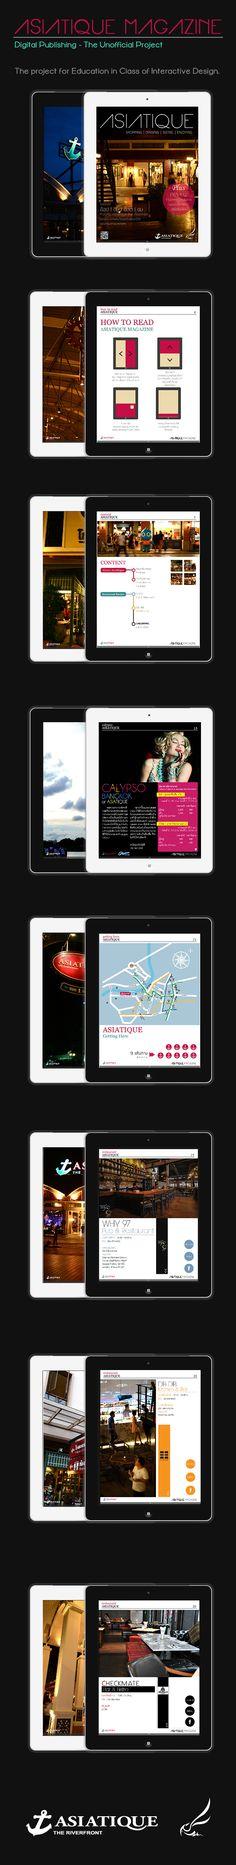 Stay up to date with daily web design news:  http://www.fb.com/mizkowebdesign    Asiatique Magazine (Unofficial Digital Publishing) by Kew Katetunnop, via Behance    #webdesign #design #designer #inspiration #user #interface #ui #web